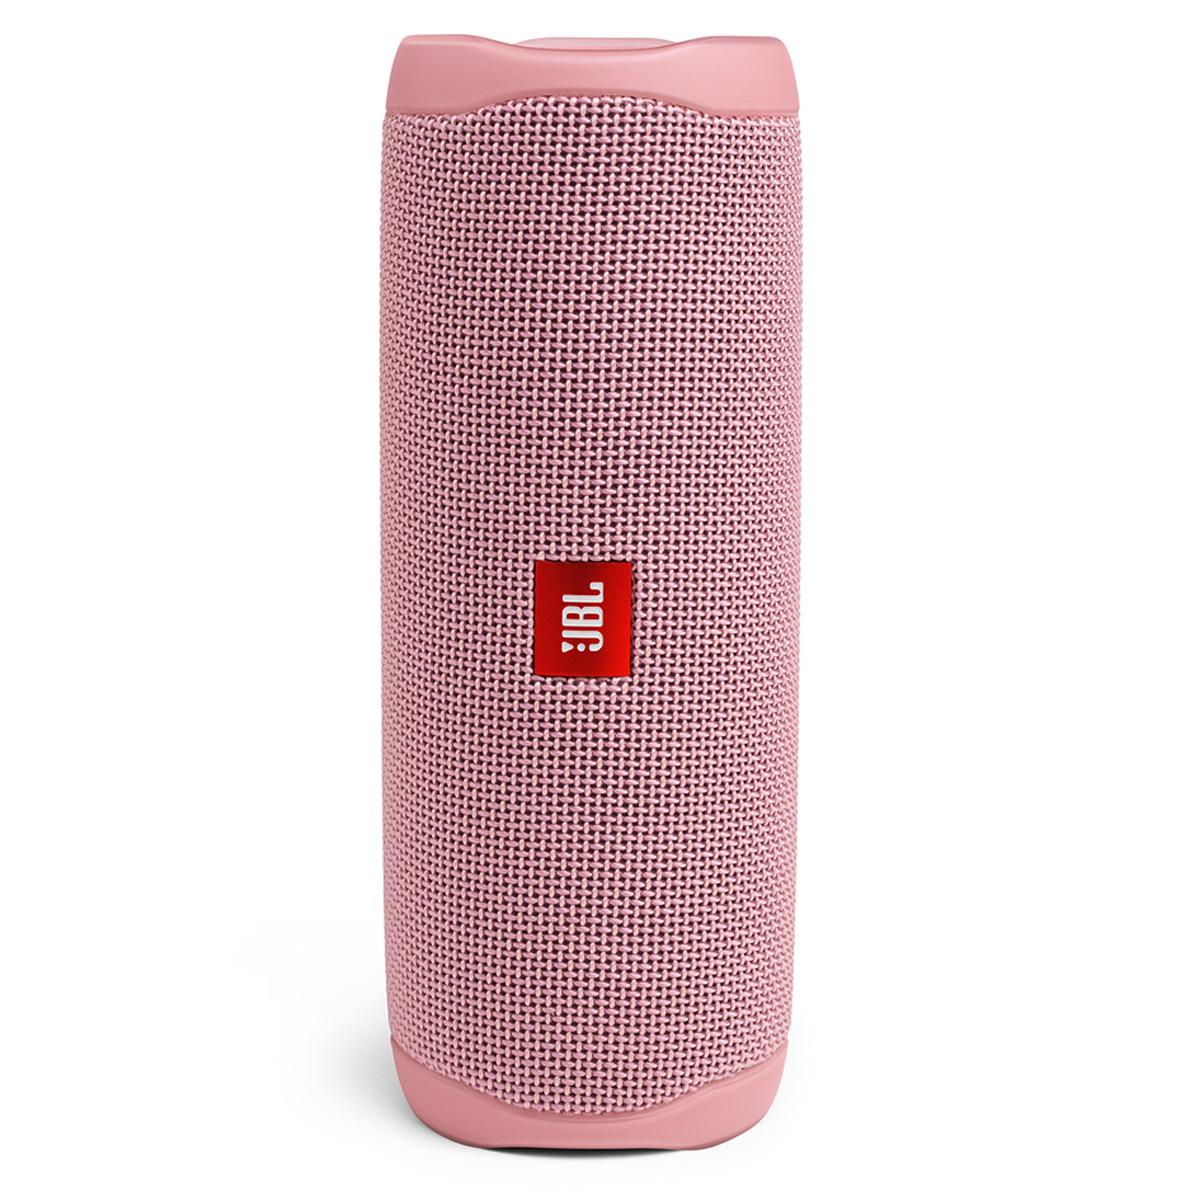 JBL-Flip-5-Portable-Waterproof-Bluetooth-Speaker thumbnail 26